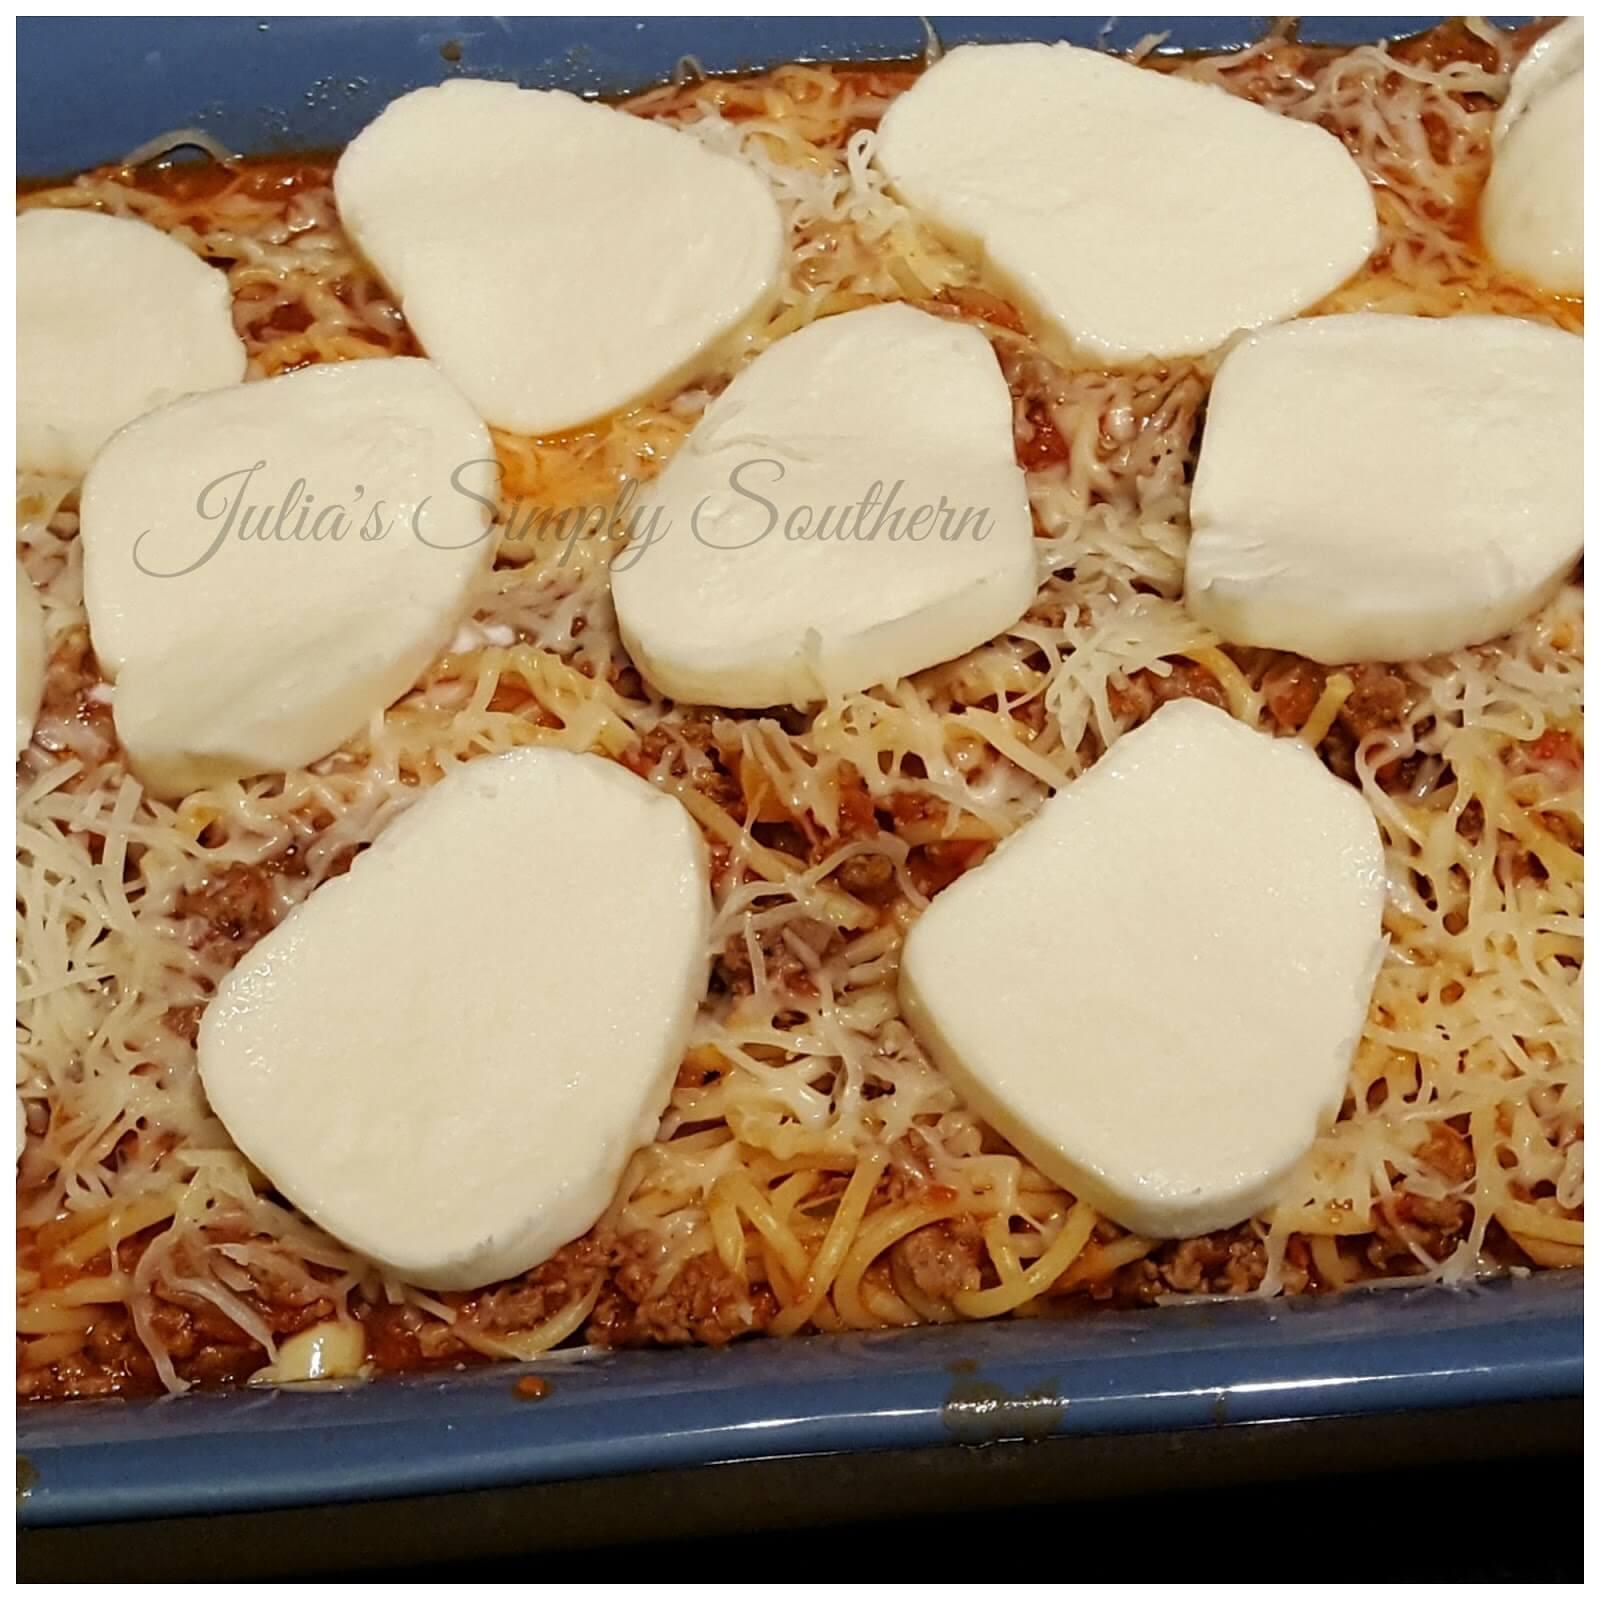 mozzarella slices ton top of baked spaghetti casserole